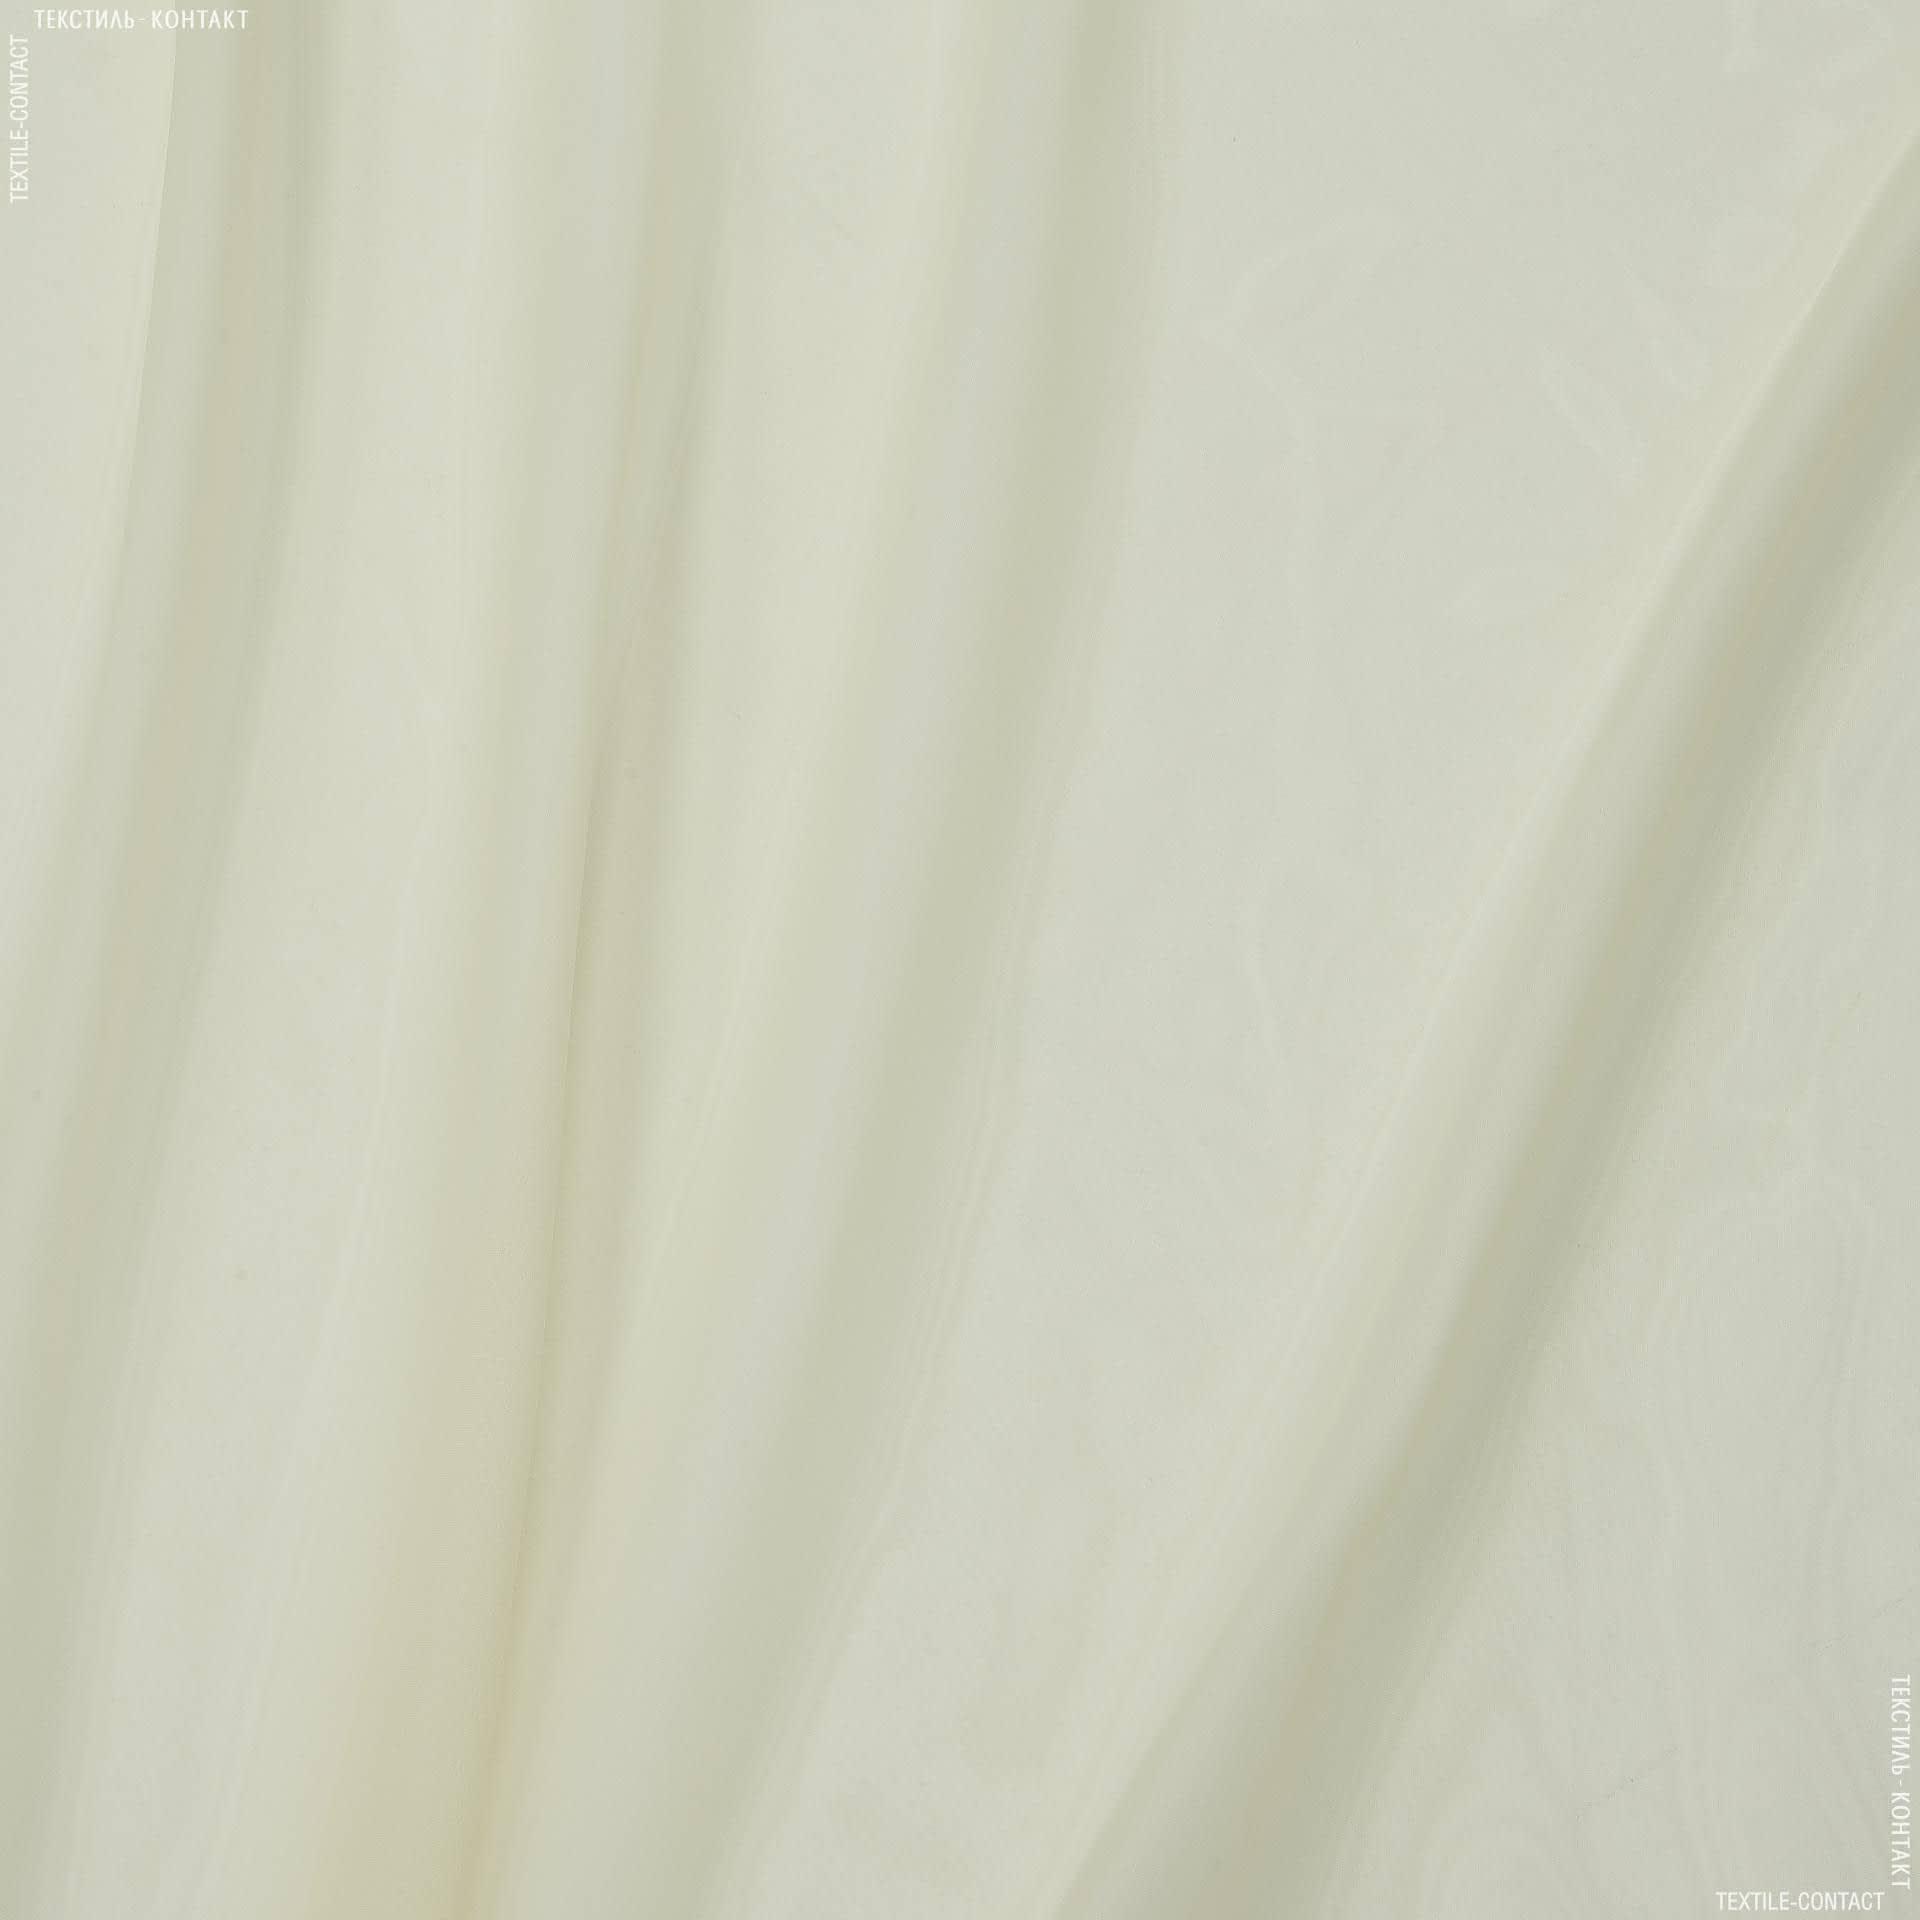 Тканини гардинні тканини - Тюль вуаль пряжене молоко